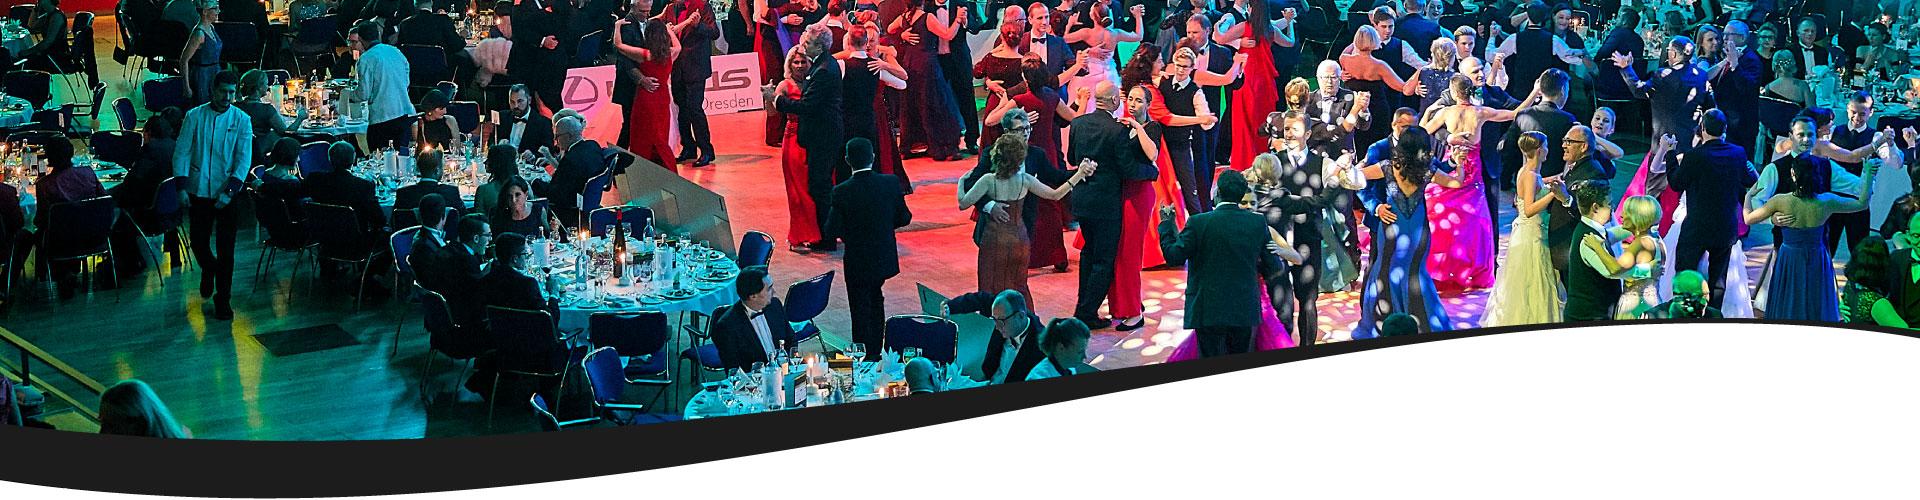 Gäste tanzen beim 10. Dresdner Golfball